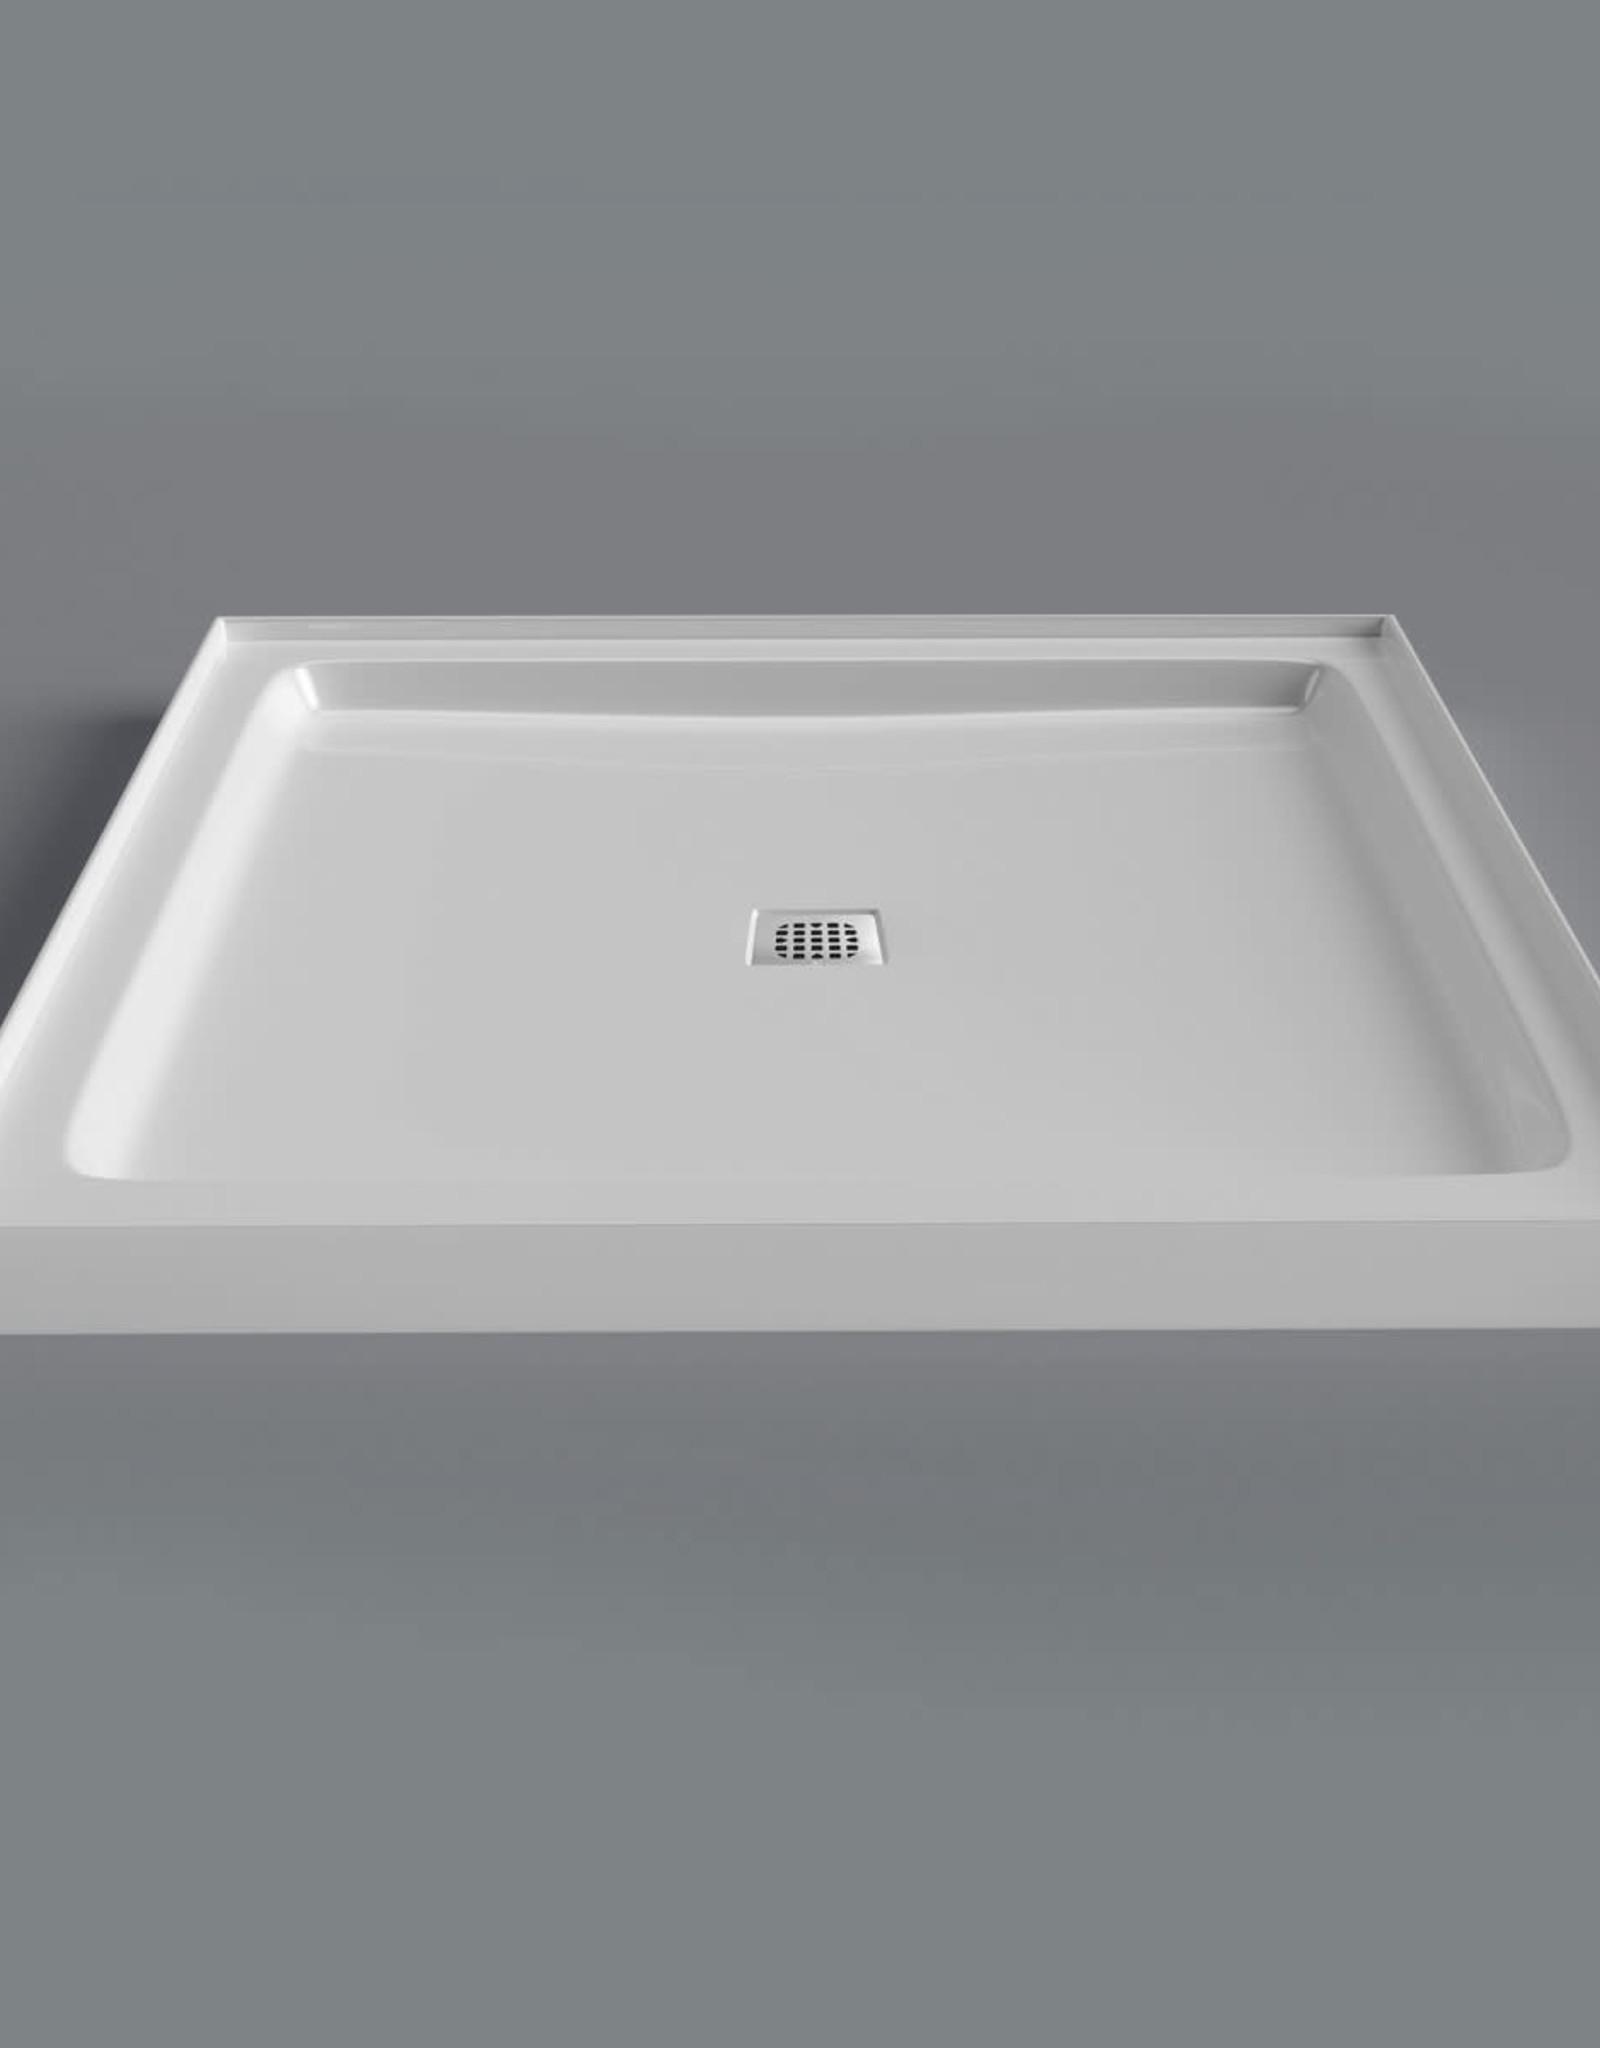 Mirolin Mirolin Strada Alcove Shower Base Acrylic White